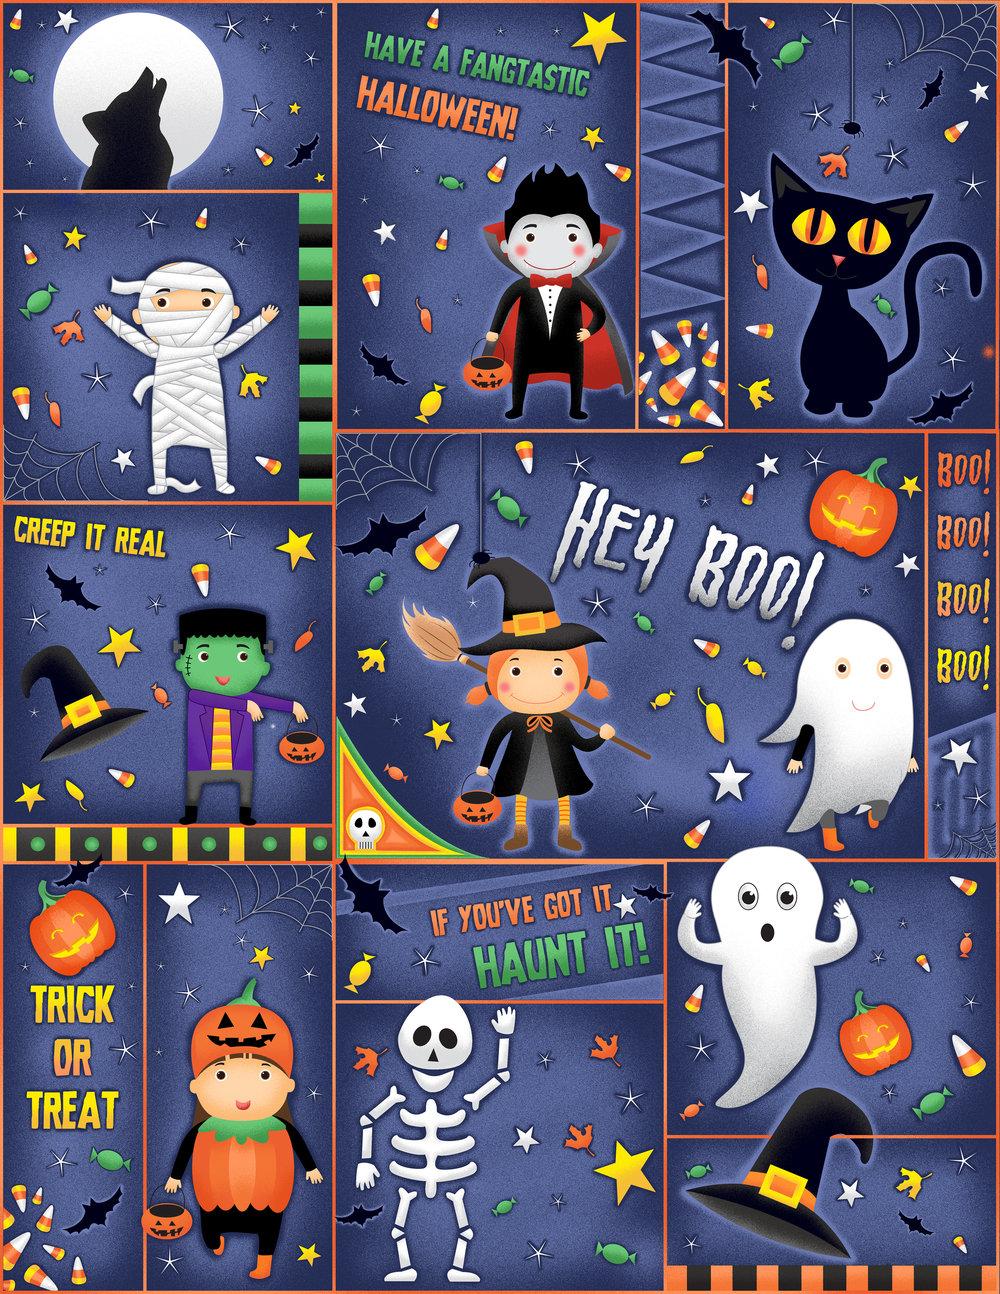 halloweenprintresize.jpg